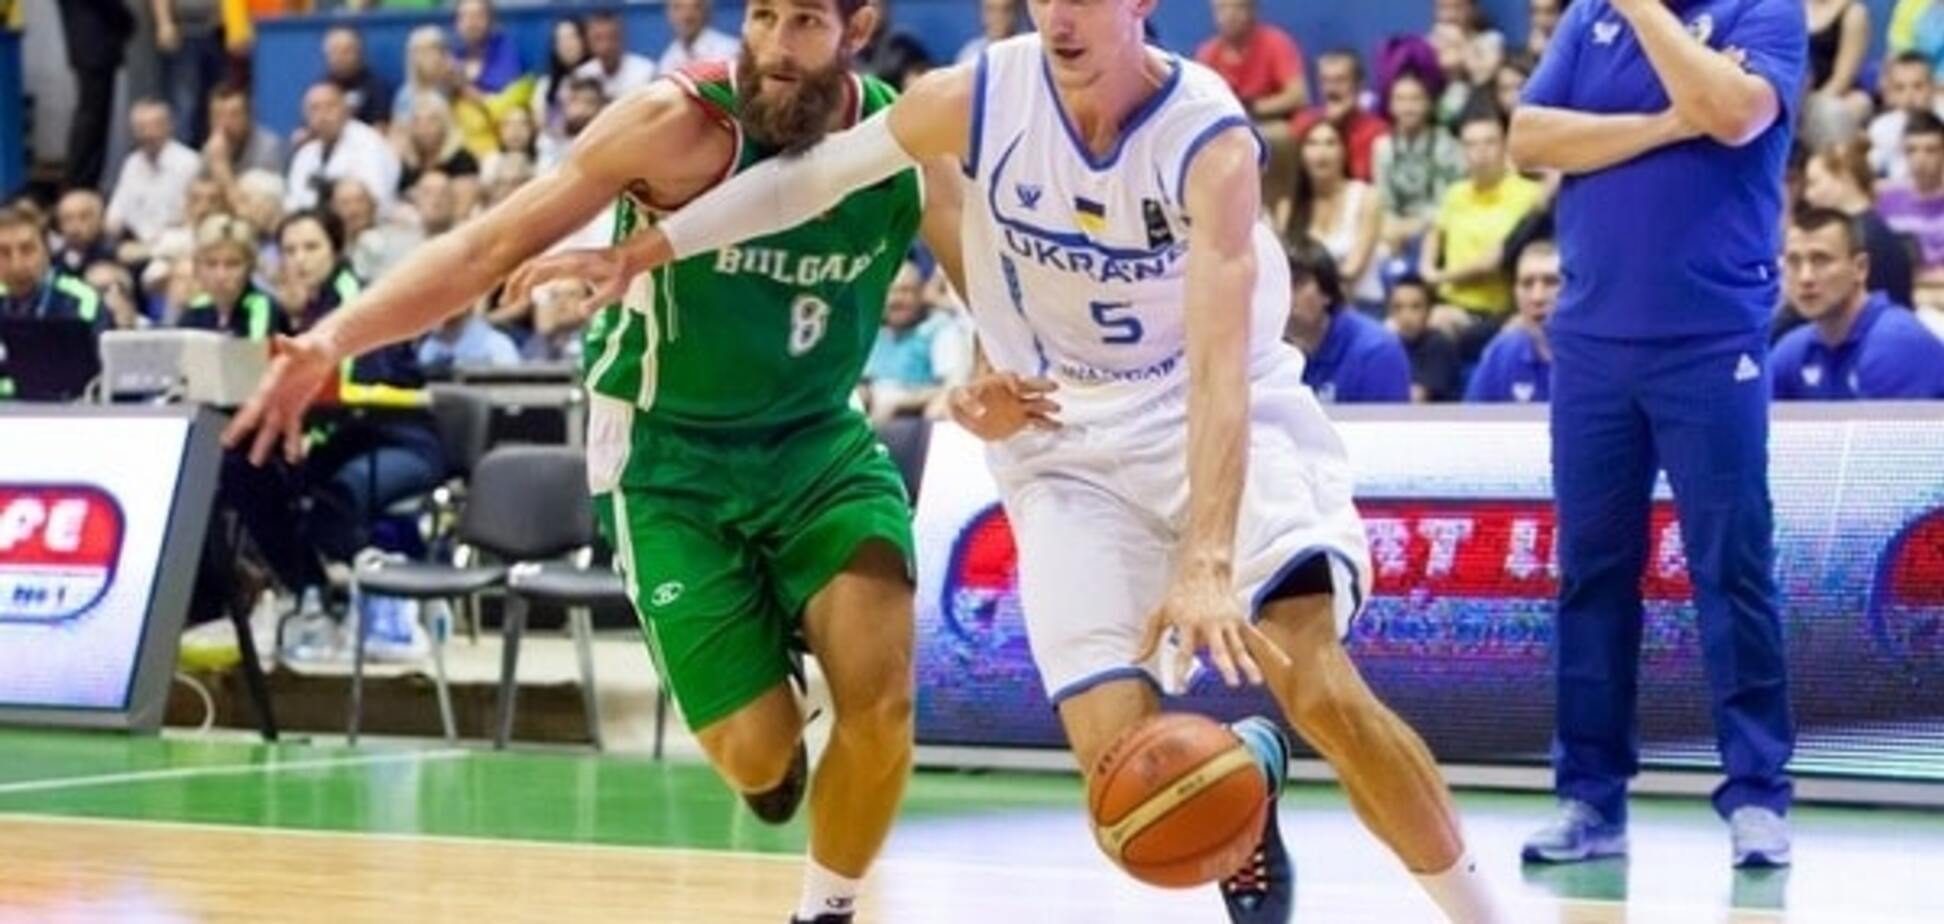 Словения - Украина: видео матча квалификации Евробаскета-2017